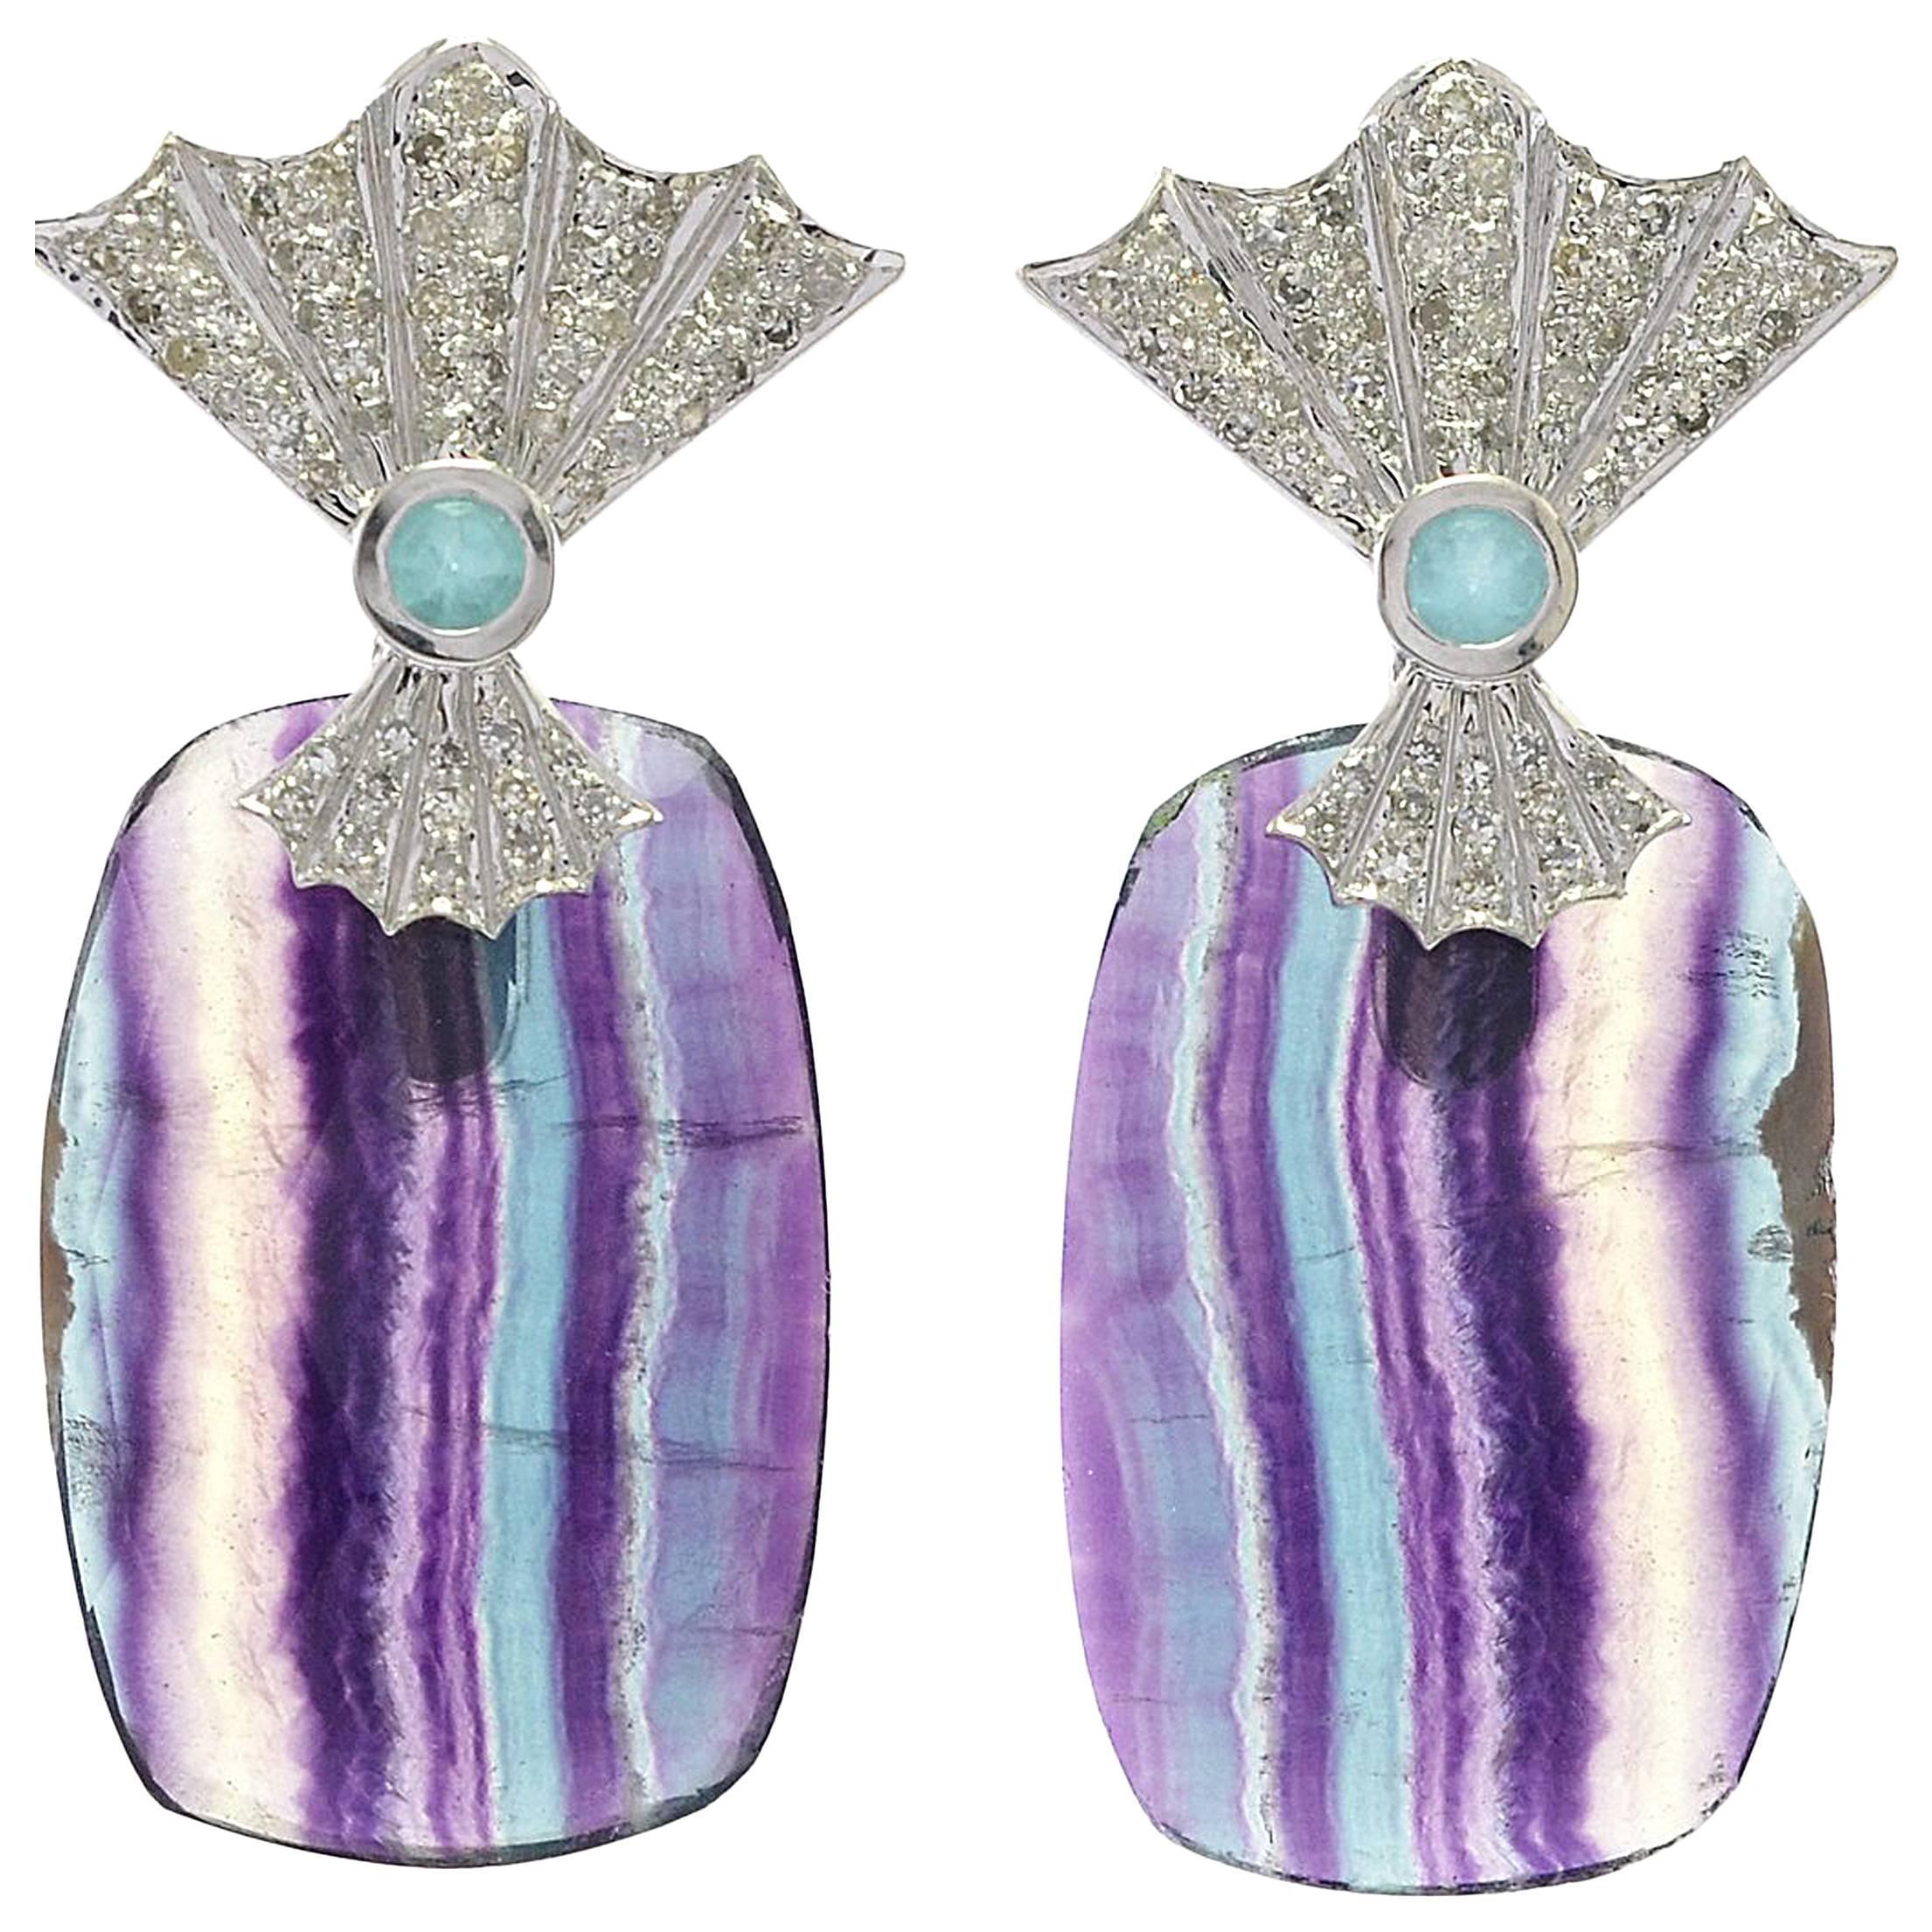 Fan Detail Mixed Gemstone and Diamond Statement Earrings